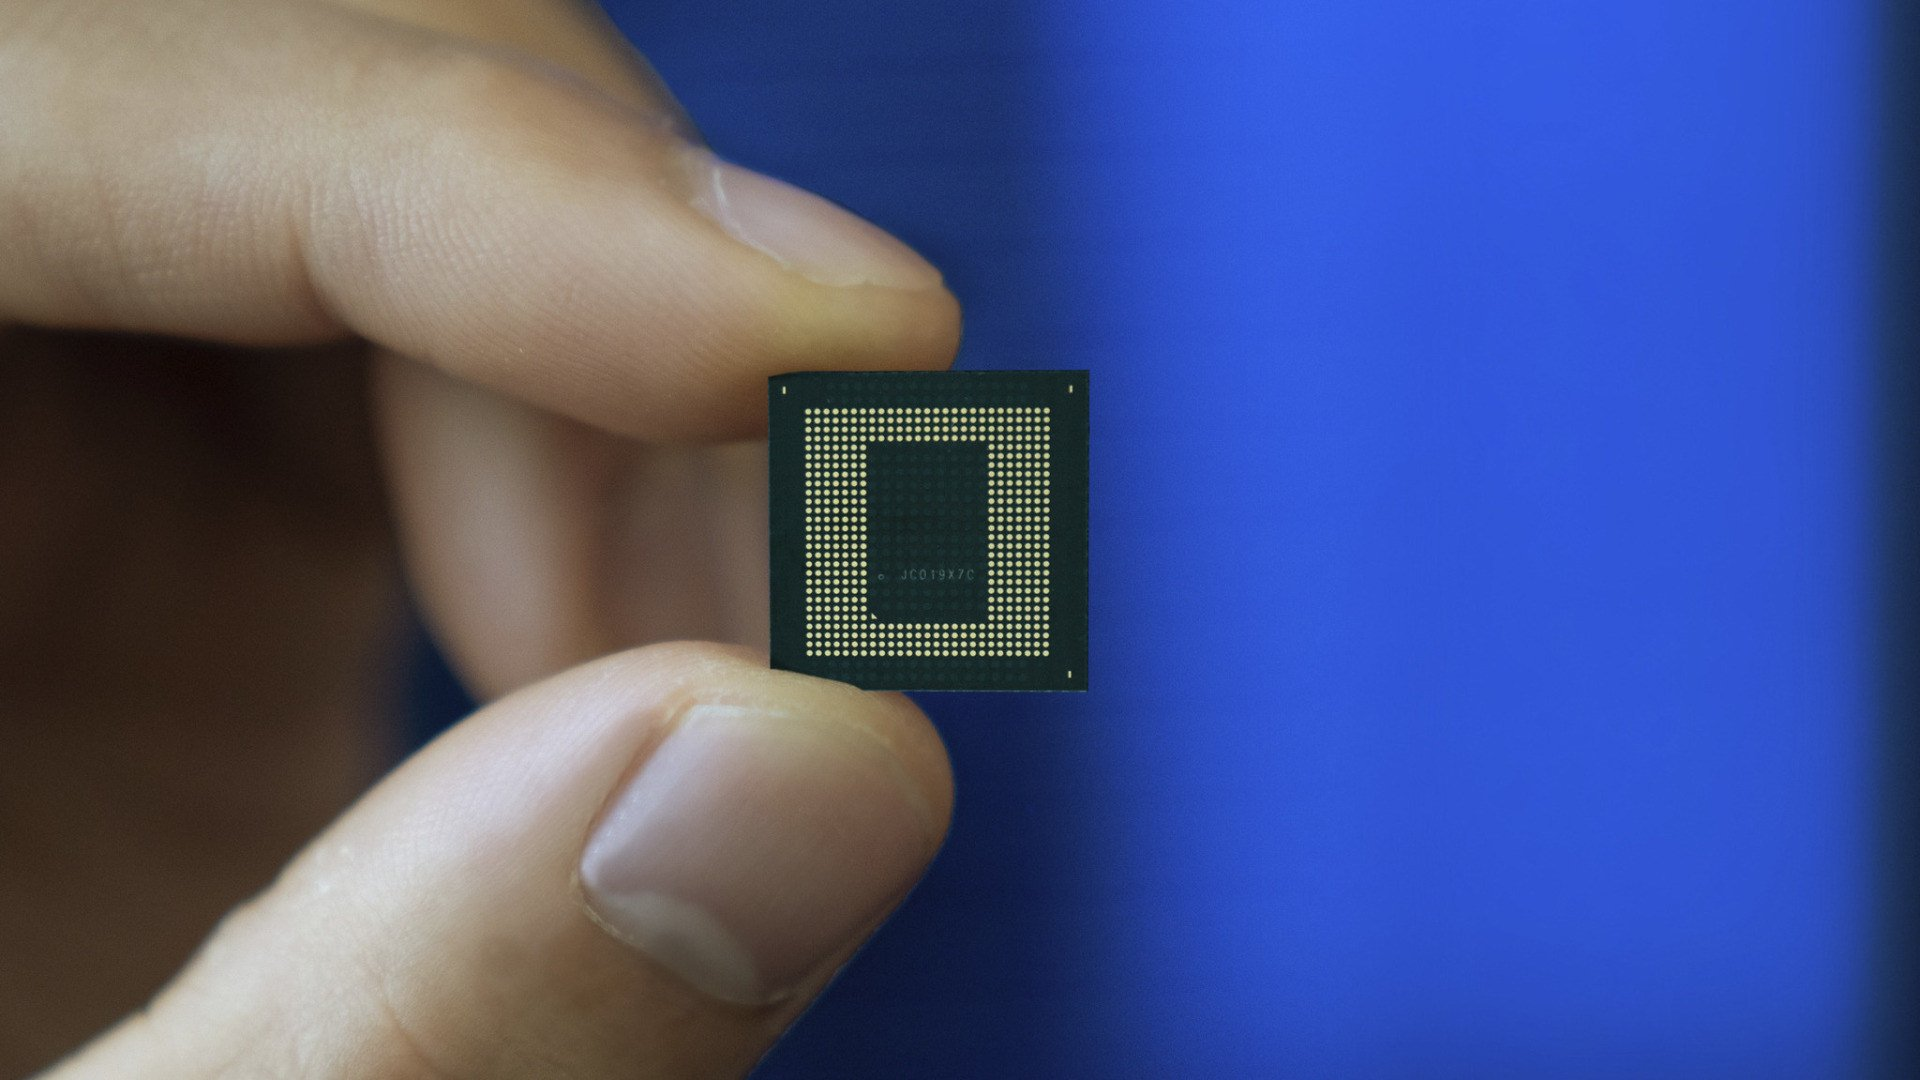 Smartphone, Prozessor, Cpu, Chip, Octacore, Arm, SoC, 5G, ARM Cortex-A55, Qualcomm Snapdragon 888 5G, Qualcomm Snapdragon 888, ARM Cortex-X1, ARM Cortex-A78, Adreno 660, Kryo 680